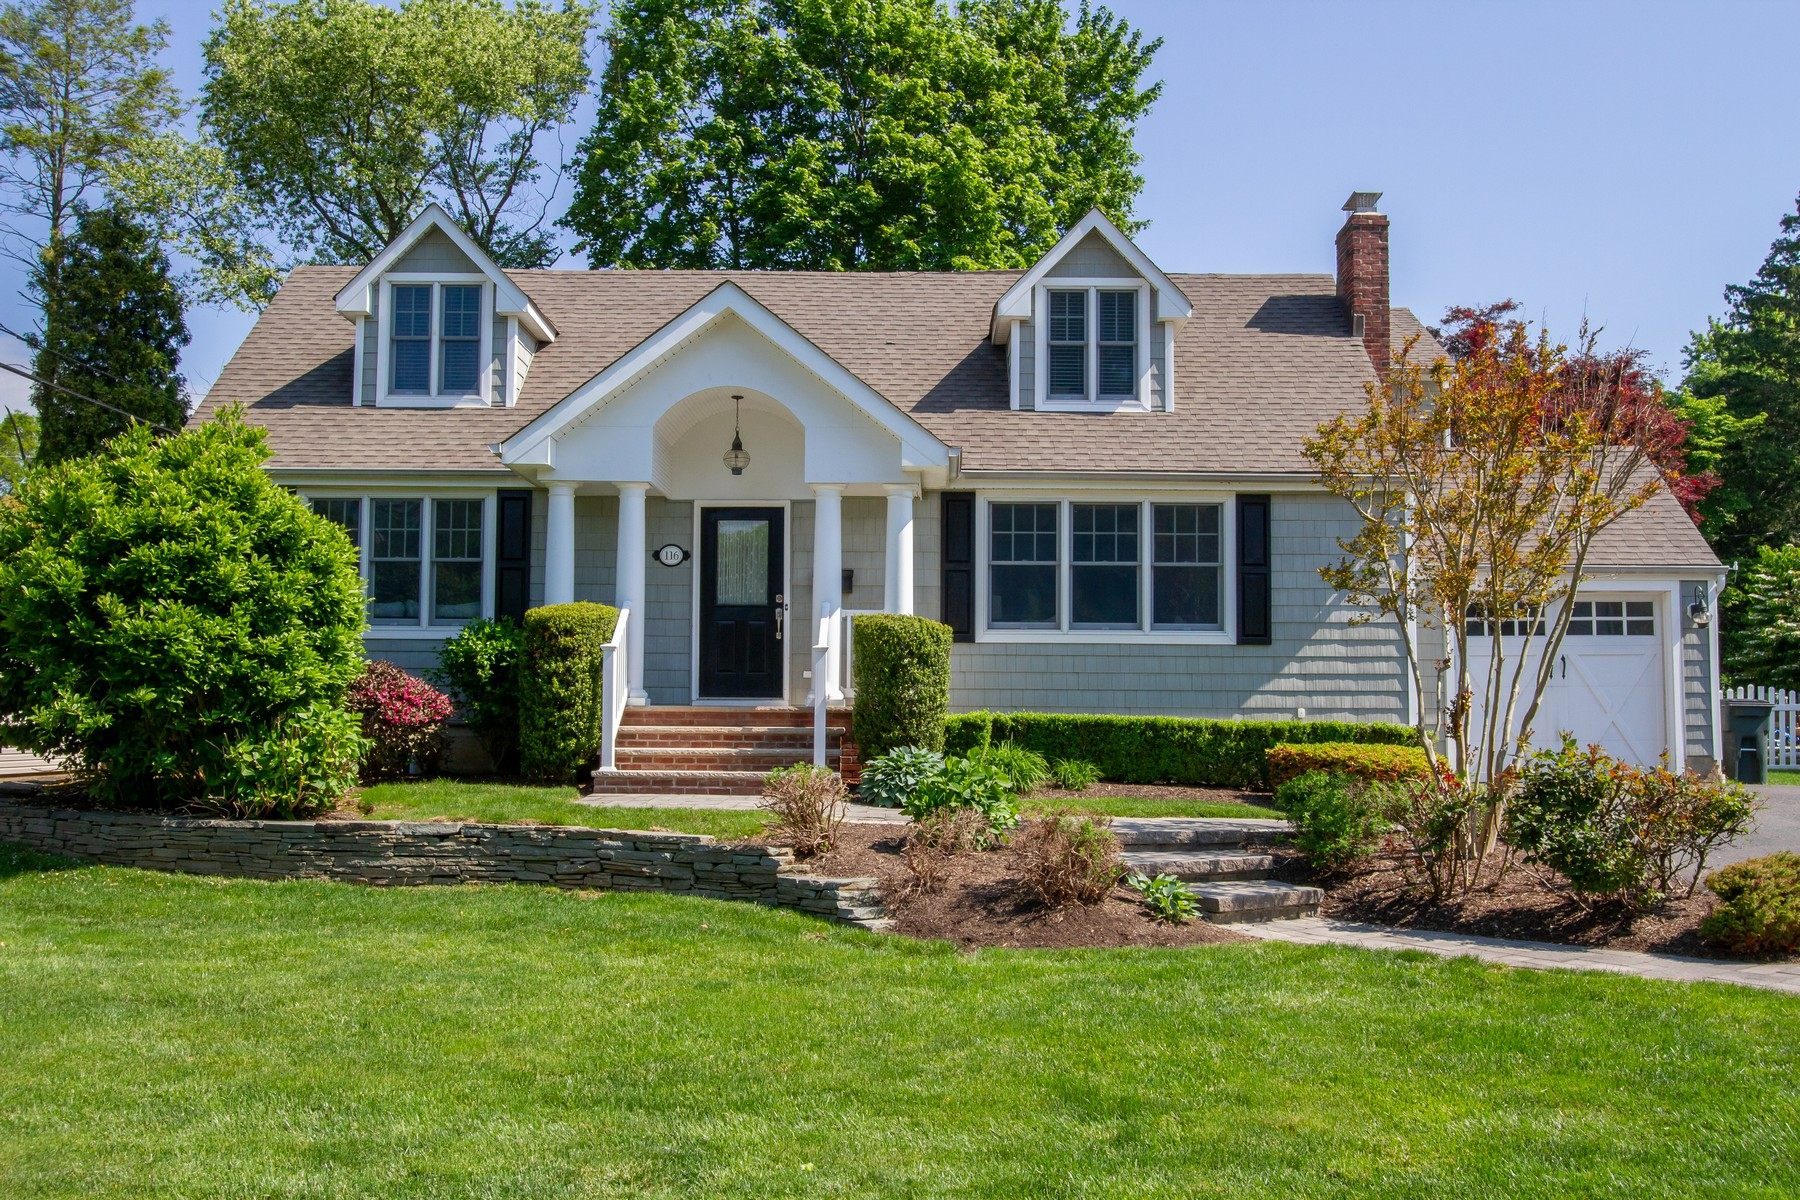 single family homes para Venda às LIVE LITTLE SILVER 116 N Sunnycrest Drive, Little Silver, Nova Jersey 07739 Estados Unidos